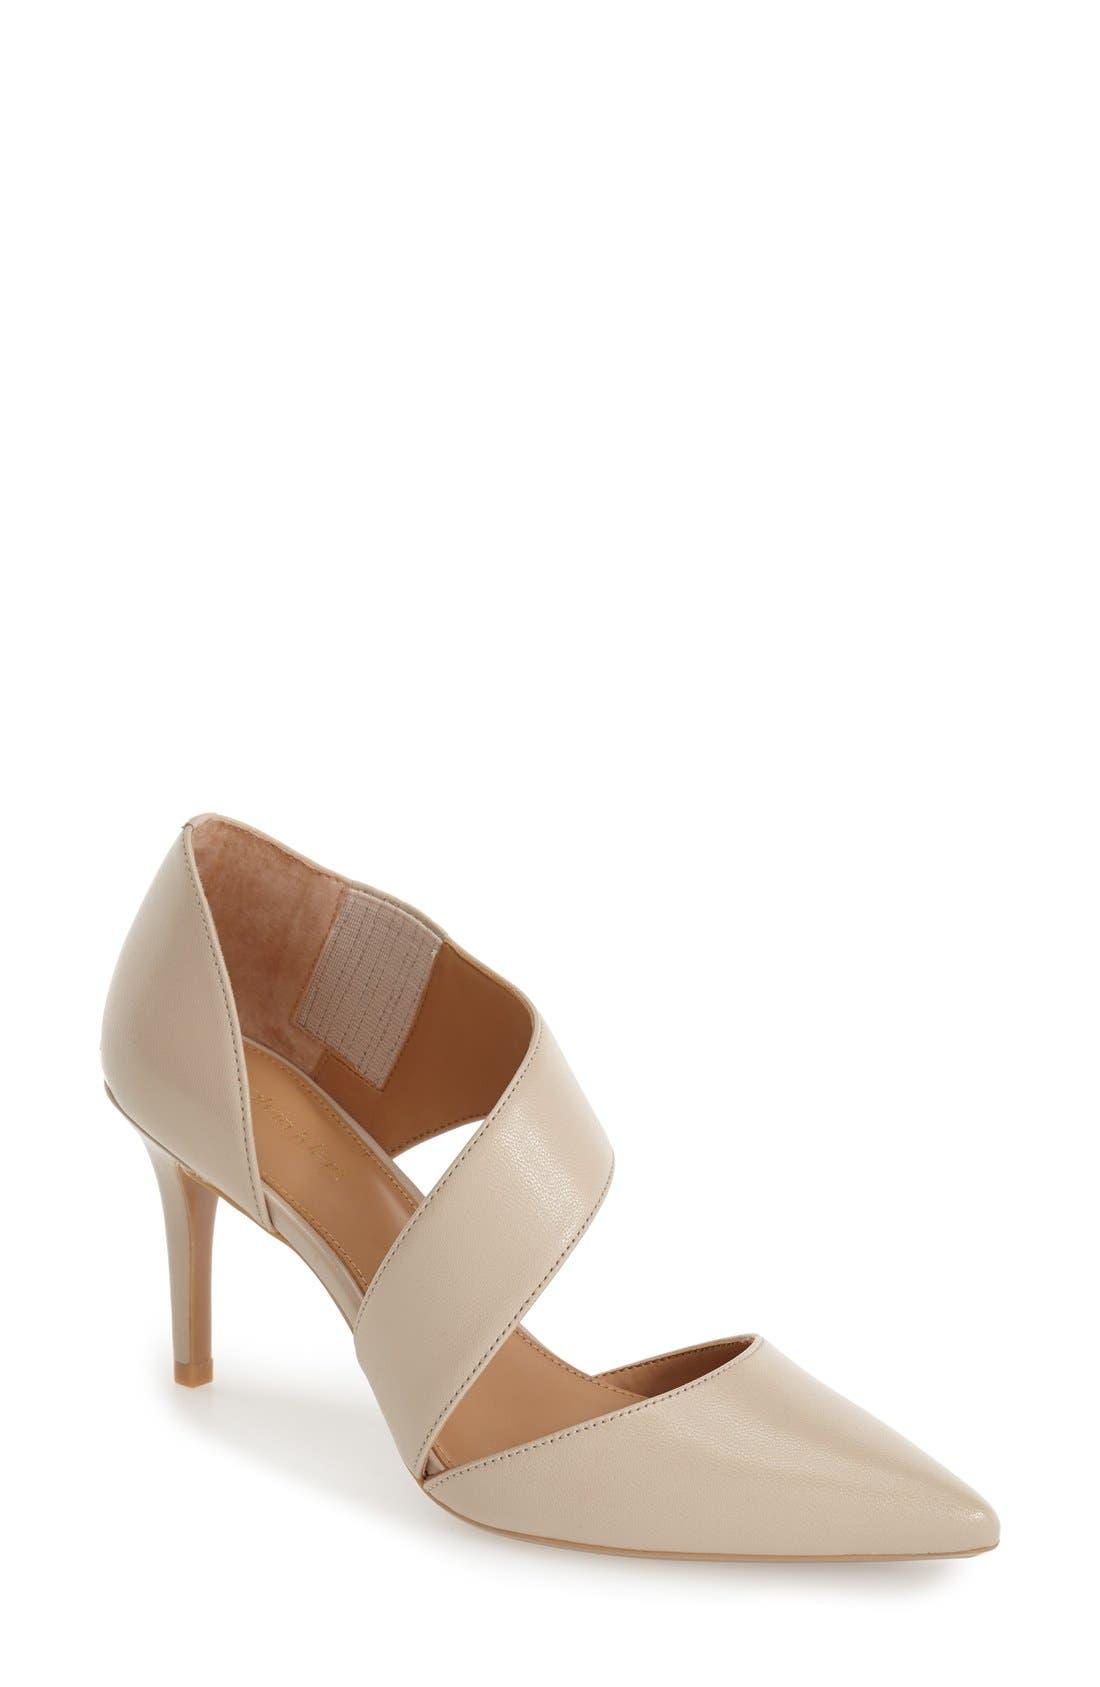 Alternate Image 1 Selected - Calvin Klein 'Gella' Pointy Toe Pump (Women)